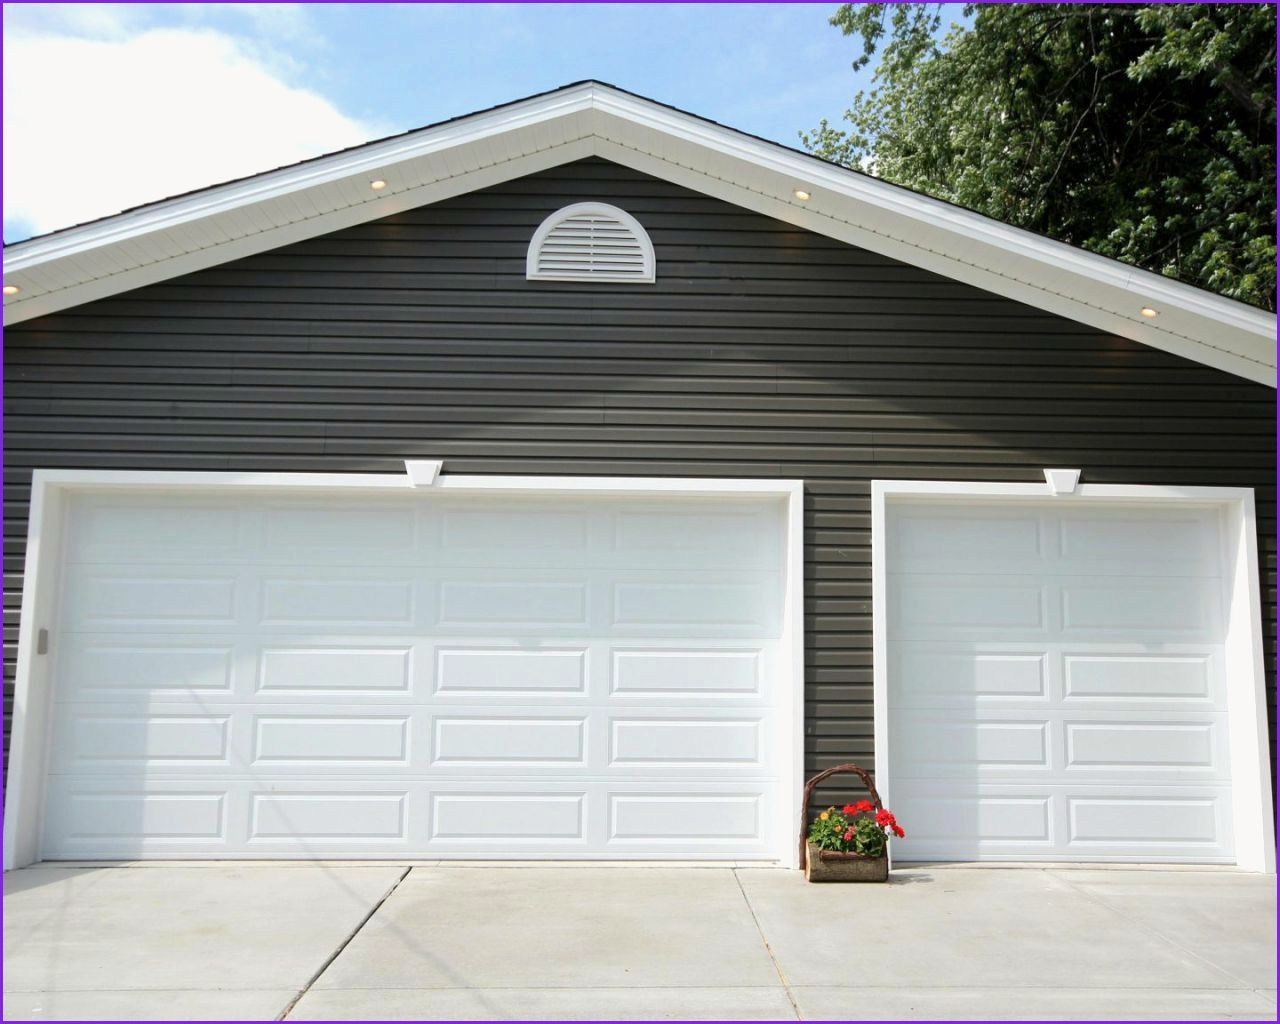 Awesome Garage Door Costco Garage Door Costco Awesome Garage